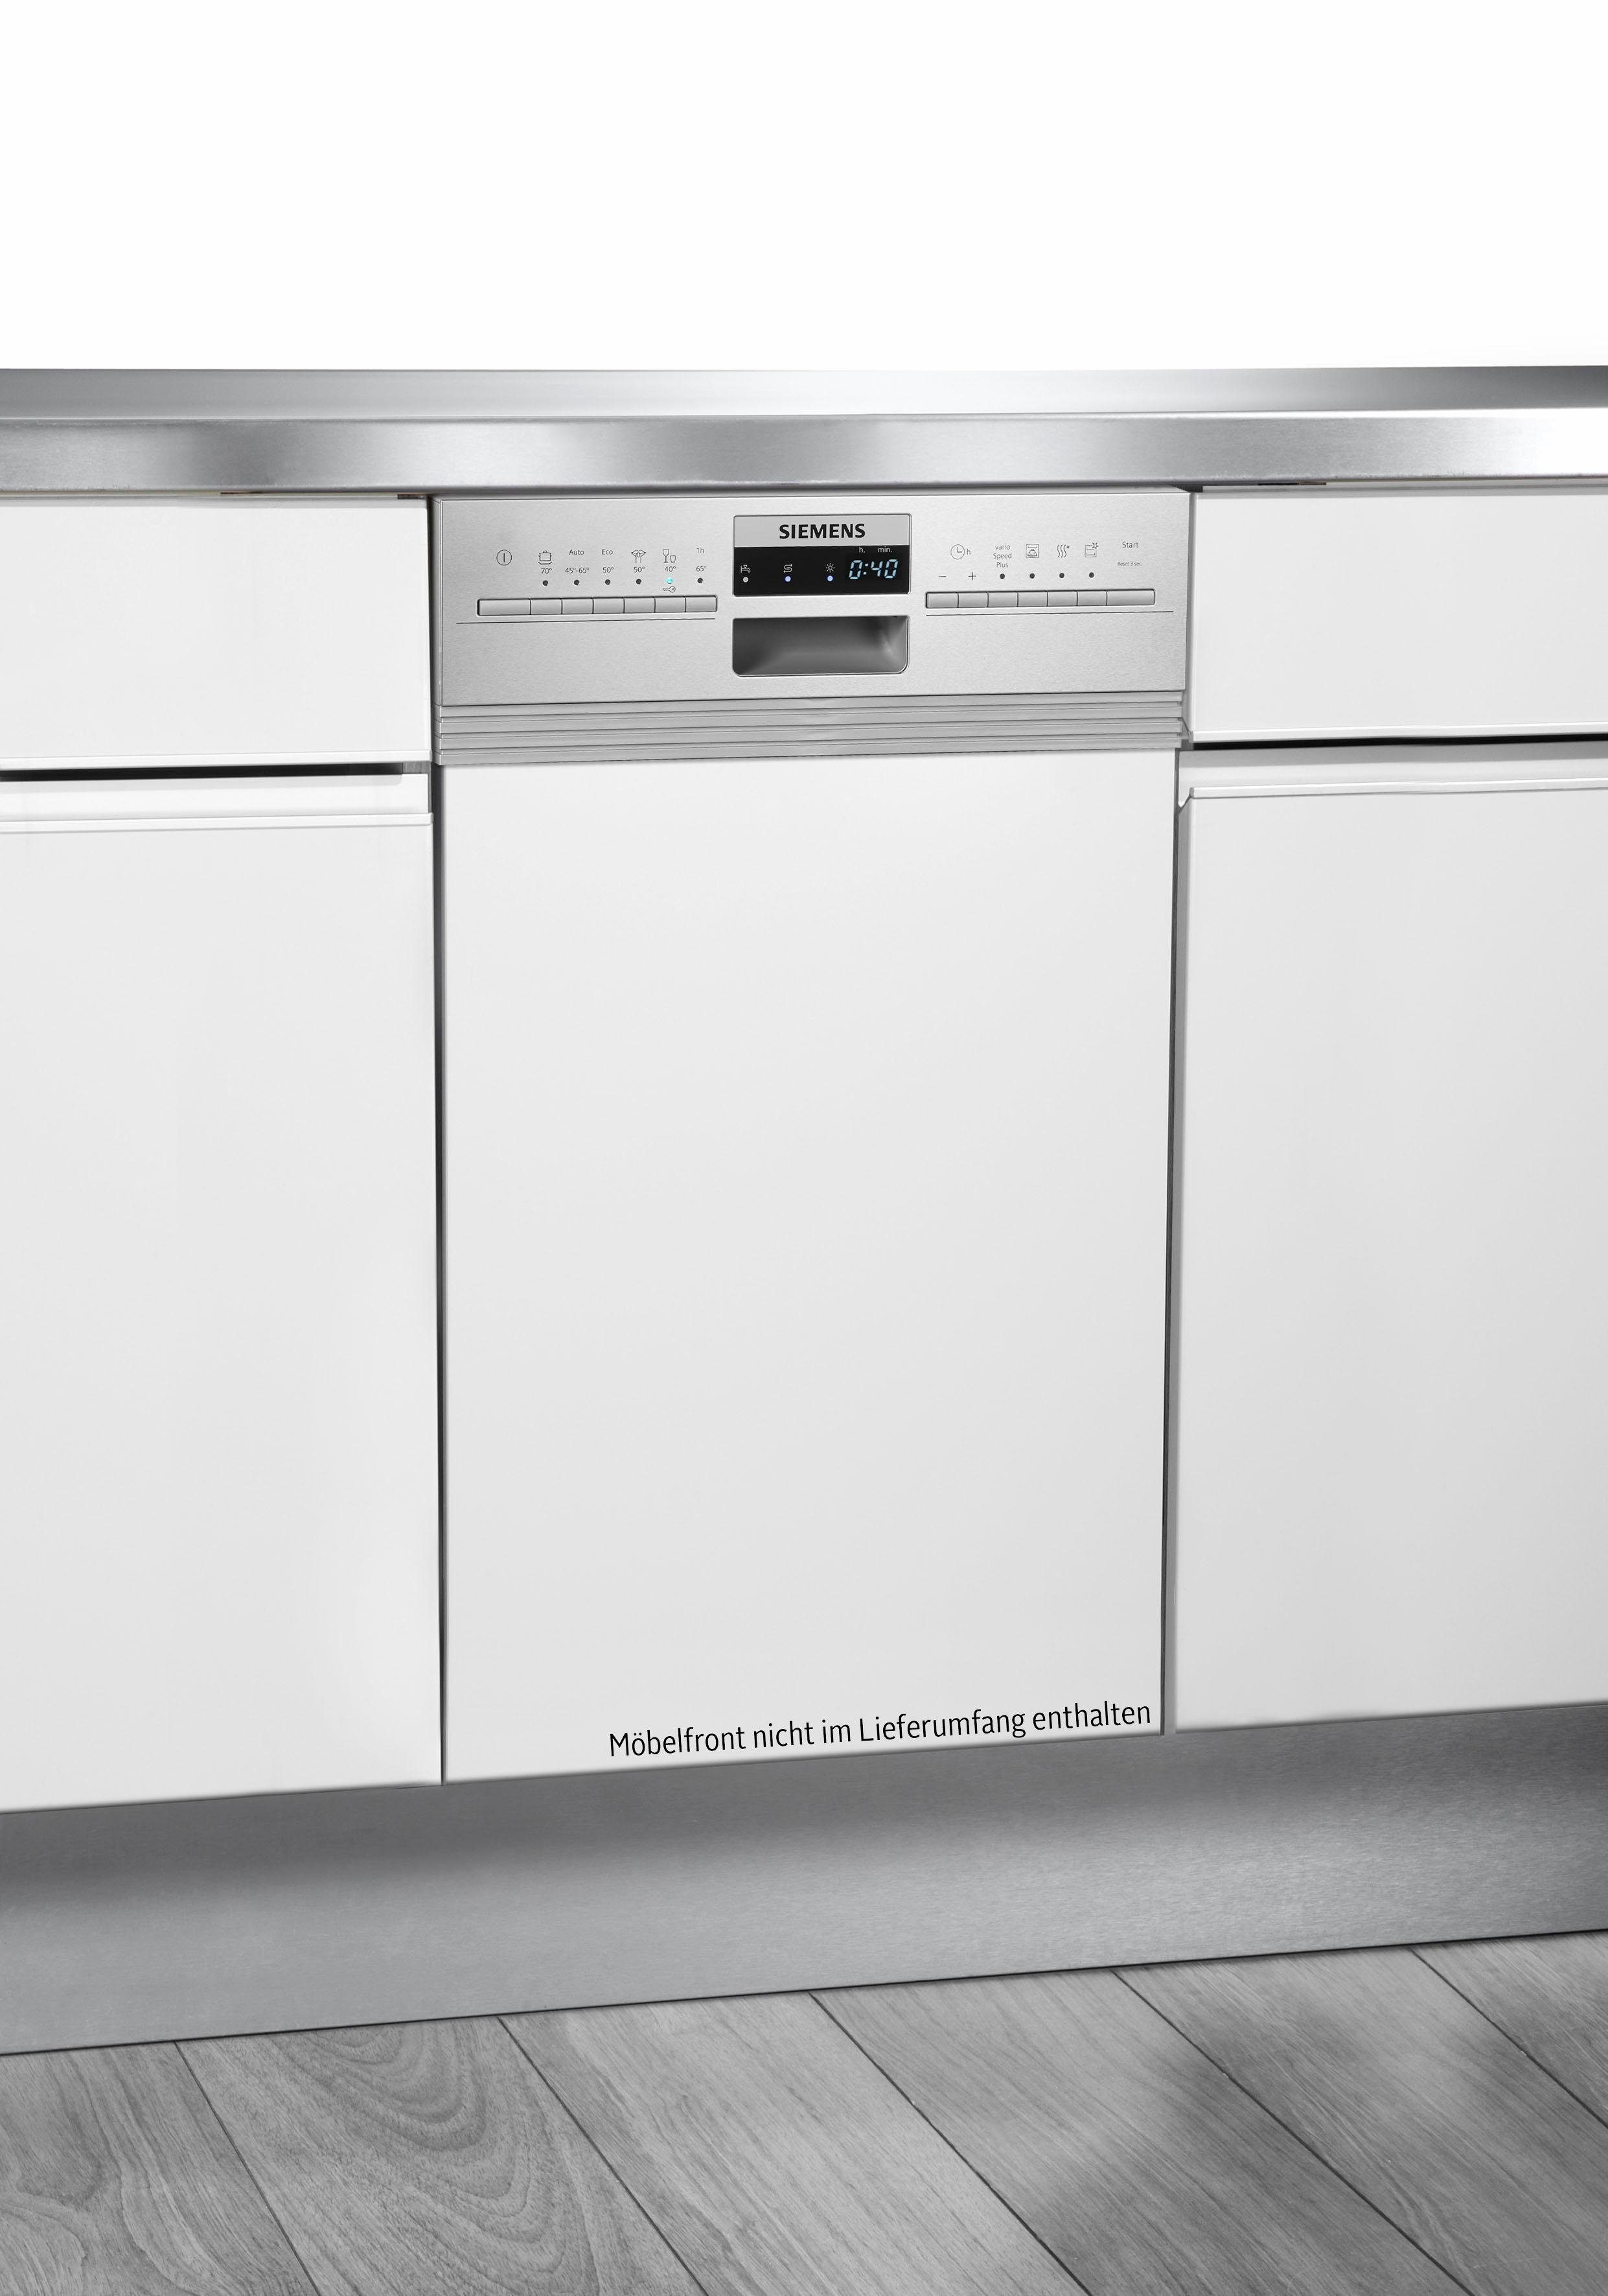 SIEMENS teilintegrierbarer Geschirrspüler, SR536S01ME, 9,5 l, 10 Maßgedecke, 45 cm breit